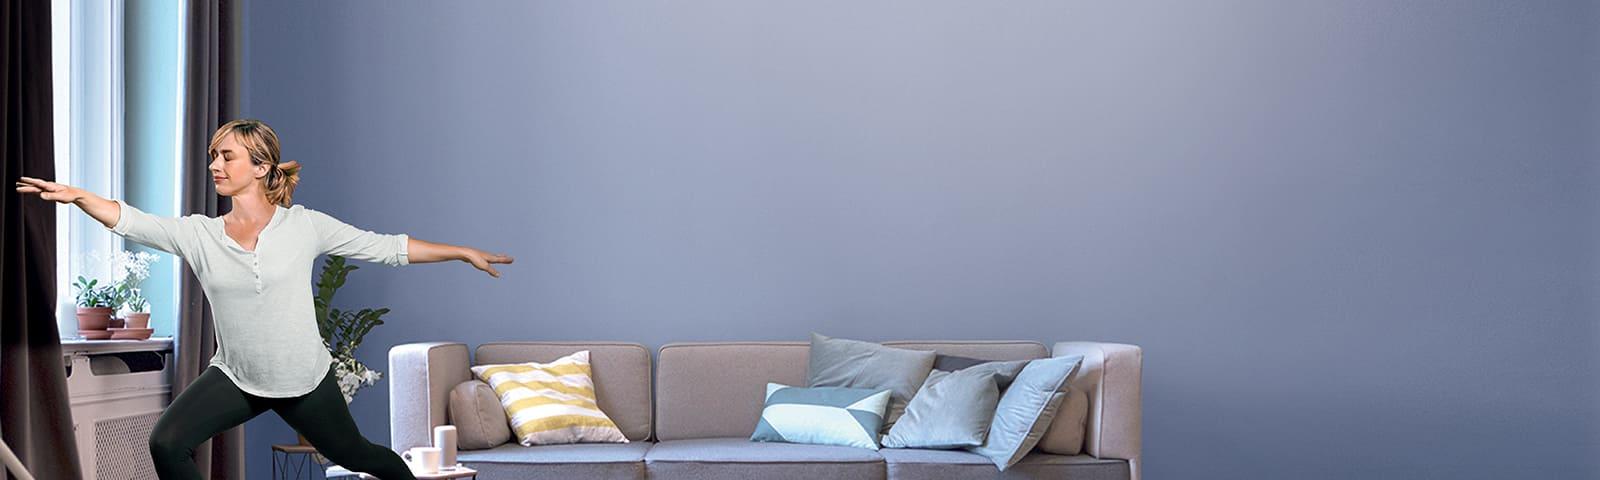 compte bancaire en ligne compte en banque axa banque. Black Bedroom Furniture Sets. Home Design Ideas